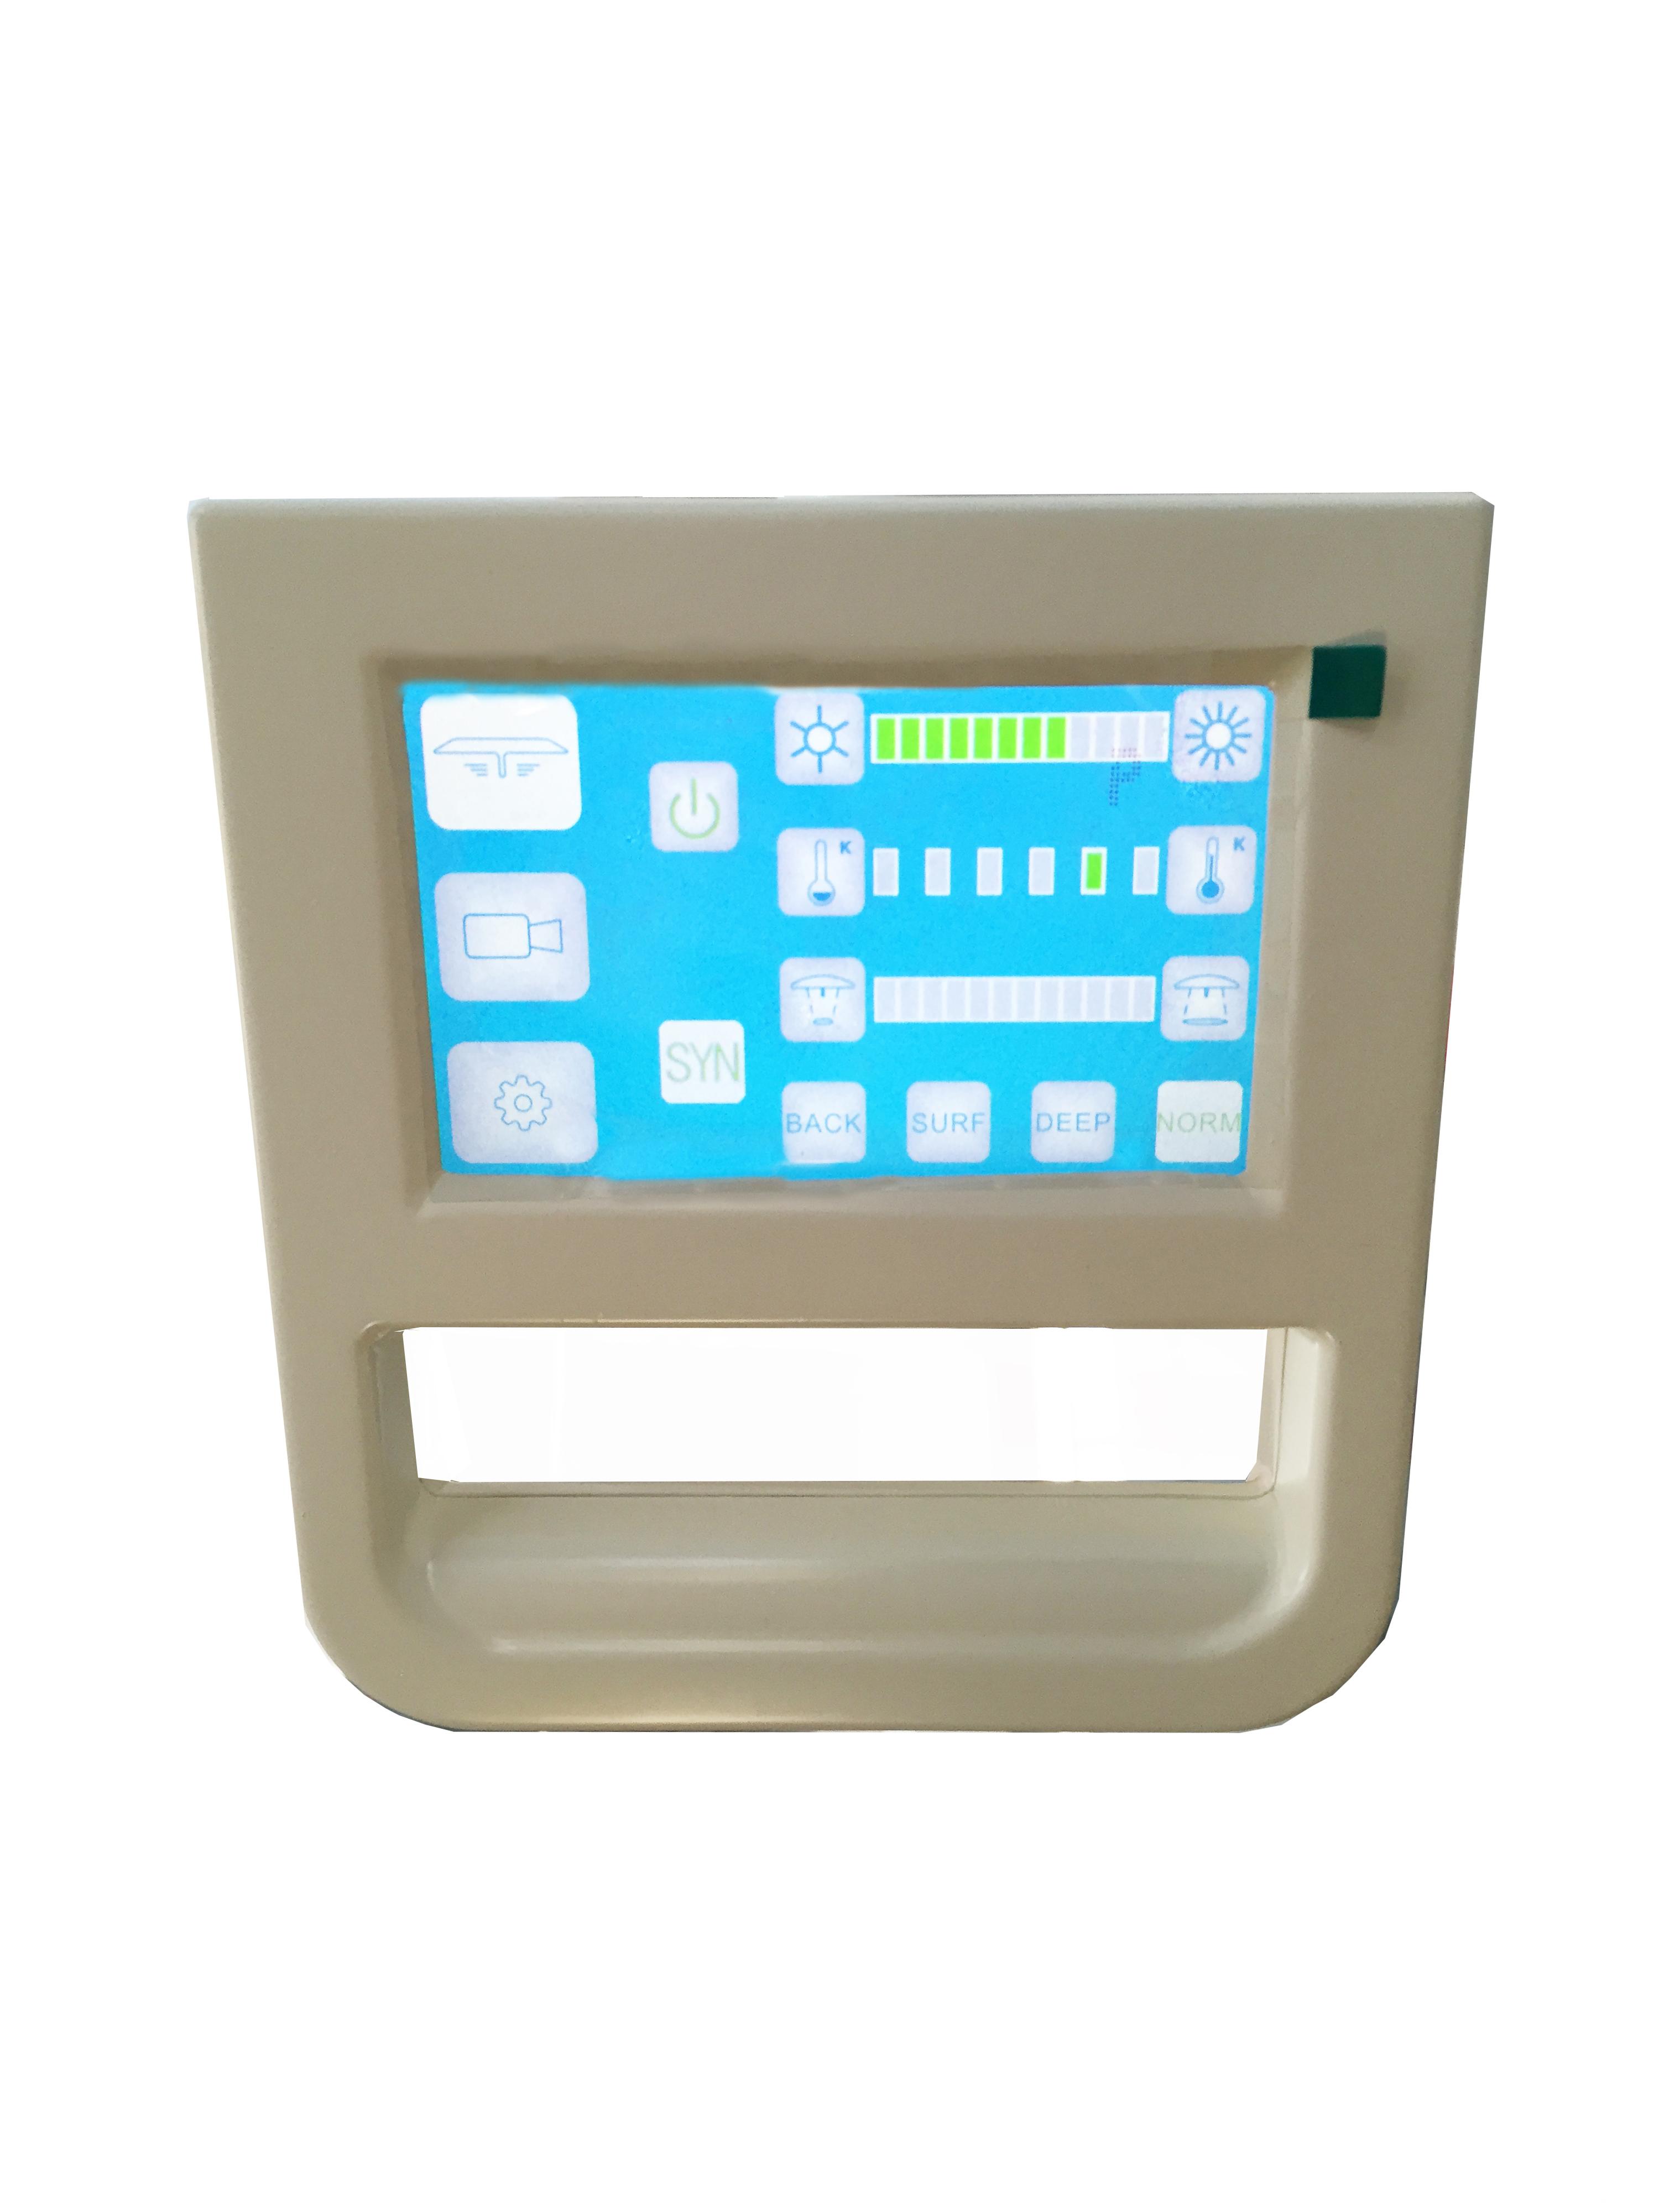 LCD controls